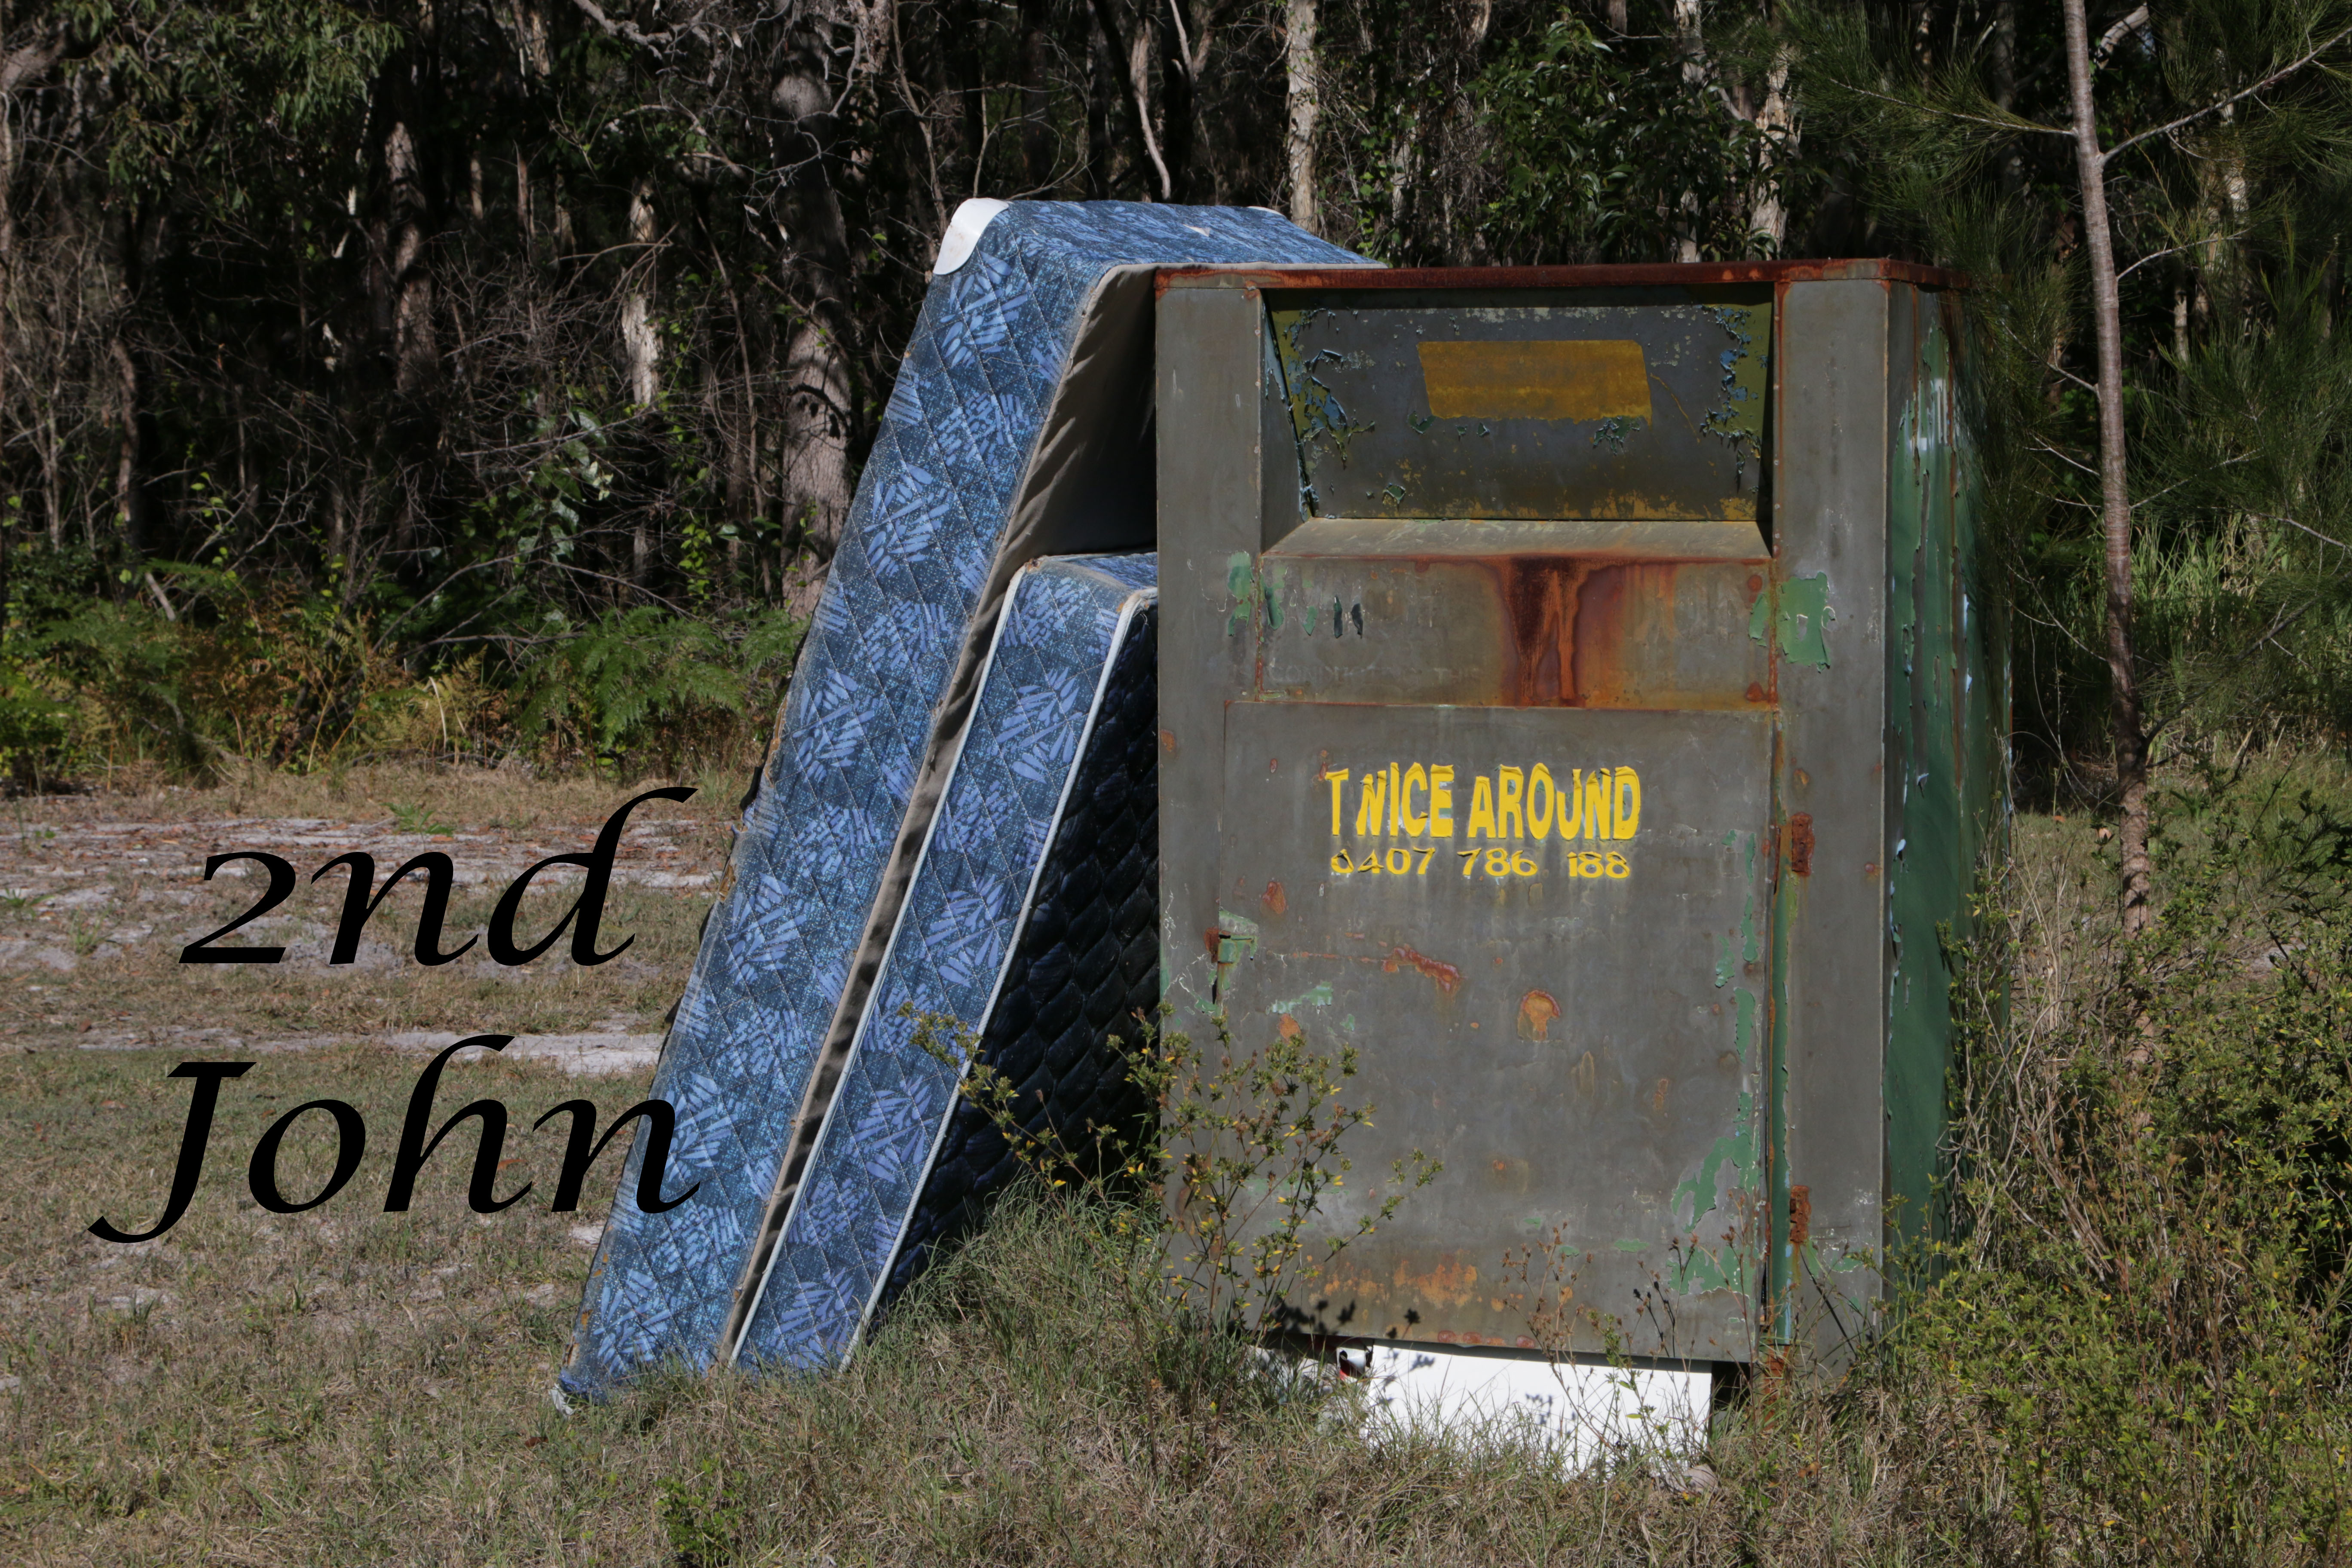 Environ Trash 2nd John